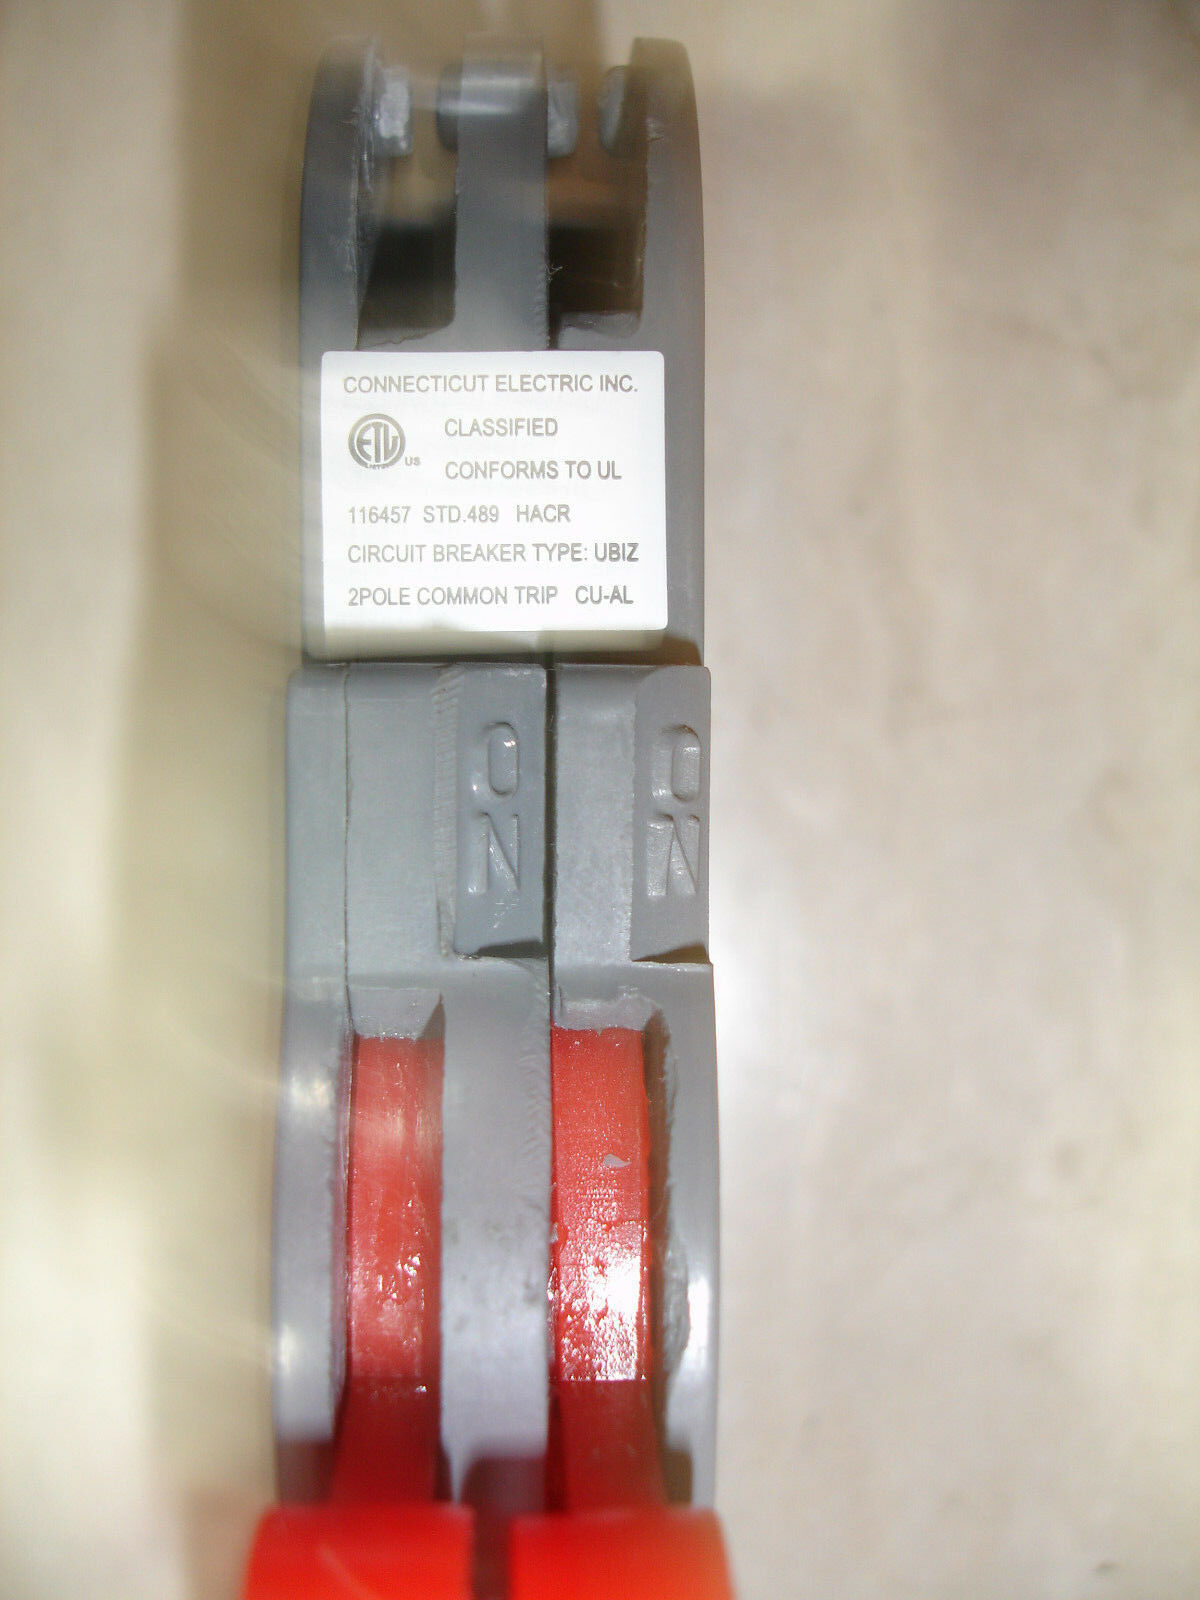 Zinsco Sylvania Gte Challenger 2 Pole 25 Amp Circuit Breaker Ships Siemens Q115 Today Ebay